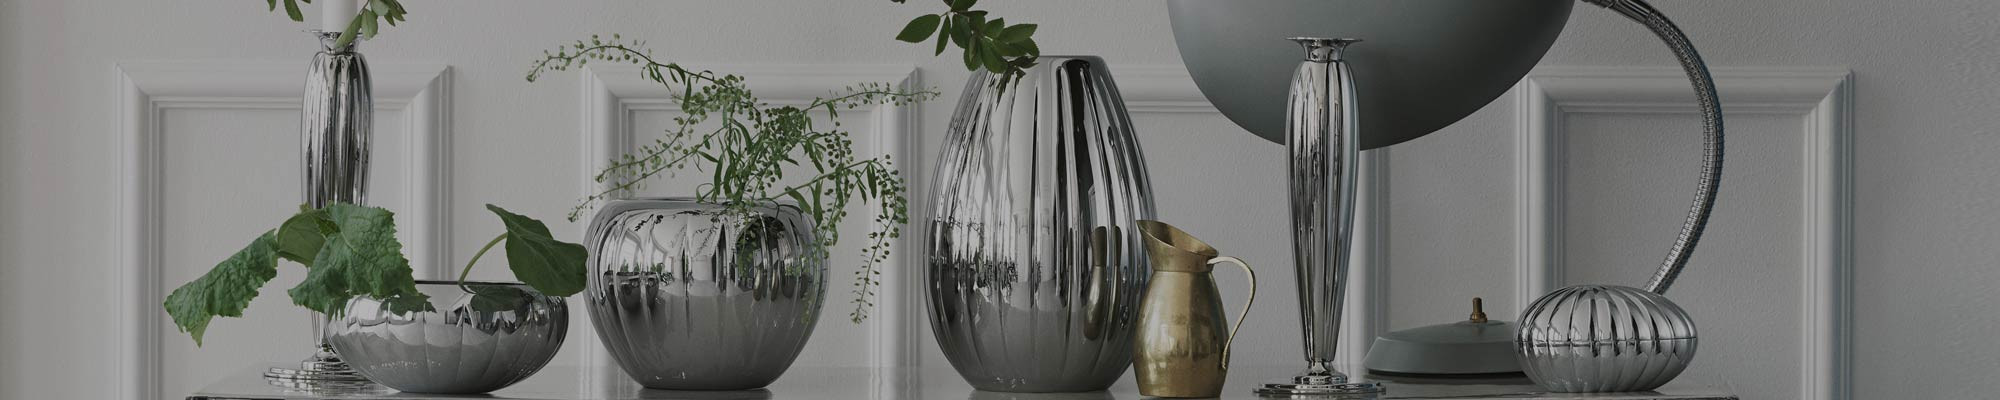 18 Lovely Georg Jensen Living Vase 2021 free download georg jensen living vase of georg jensen home accessories glassware heals pertaining to georgjensen